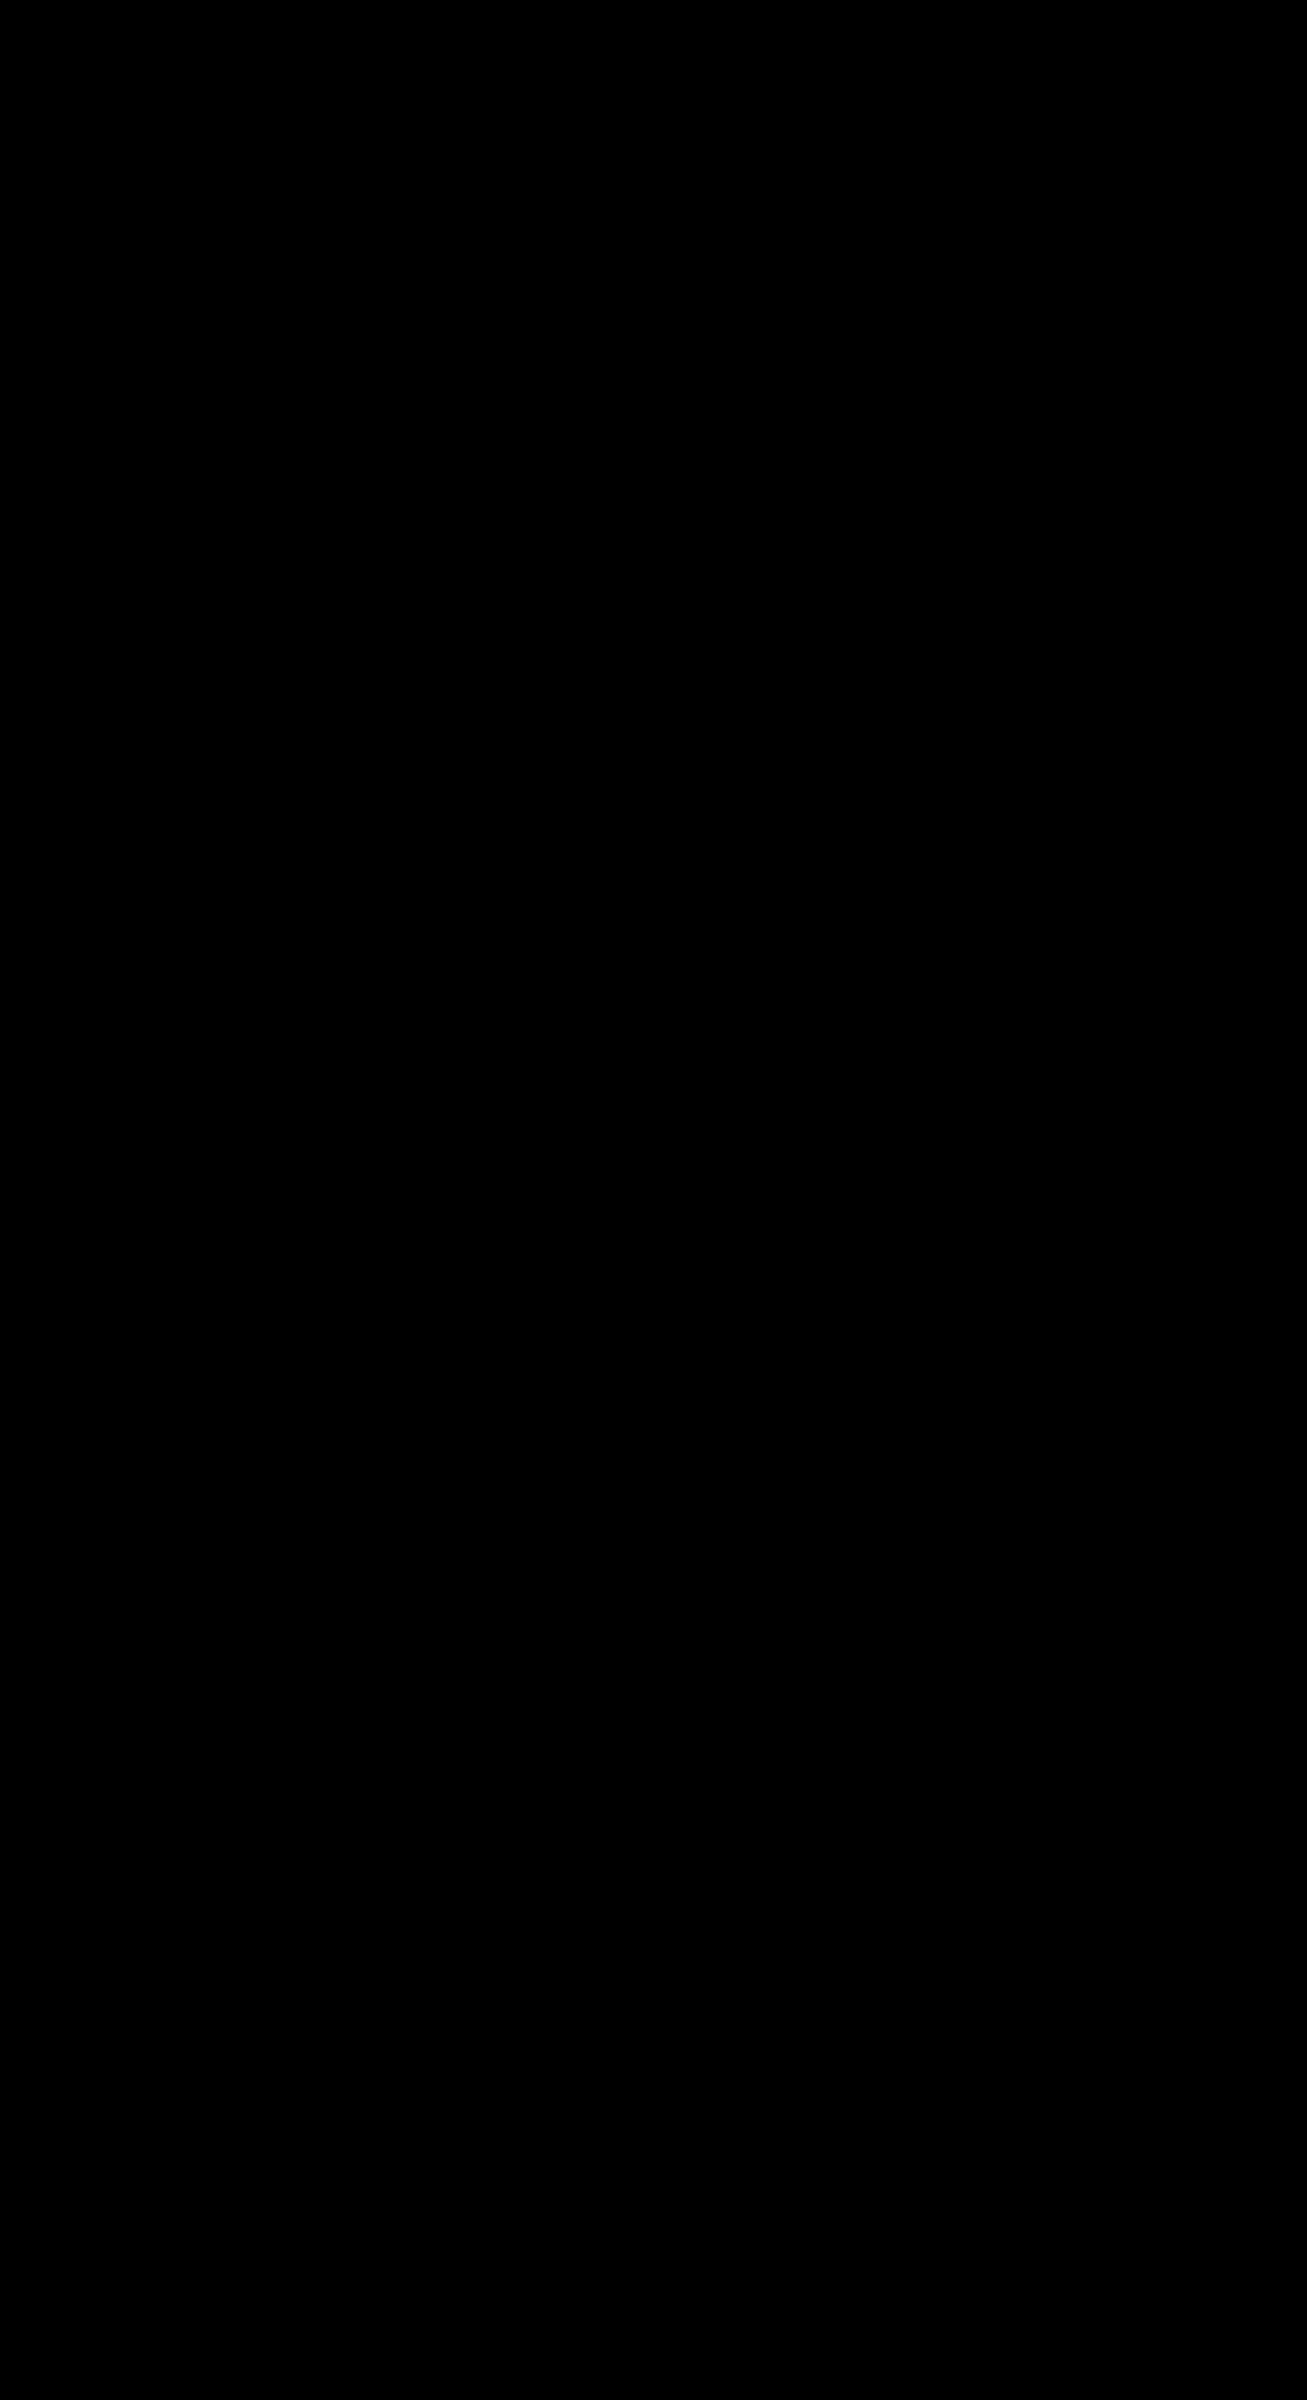 Clipart - Shoe silhouette